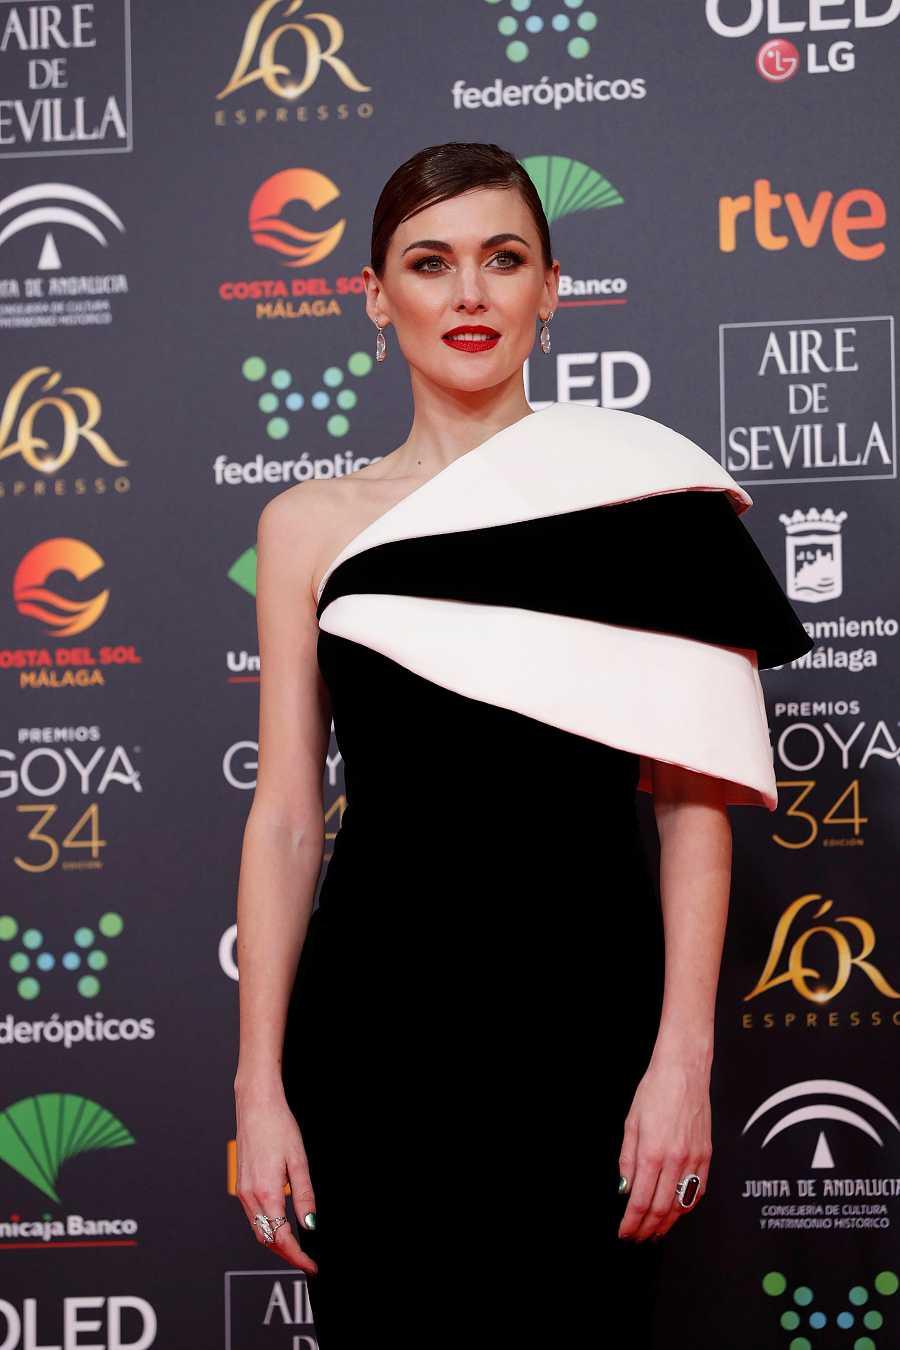 Premios Goya 2020: Marta Nieto